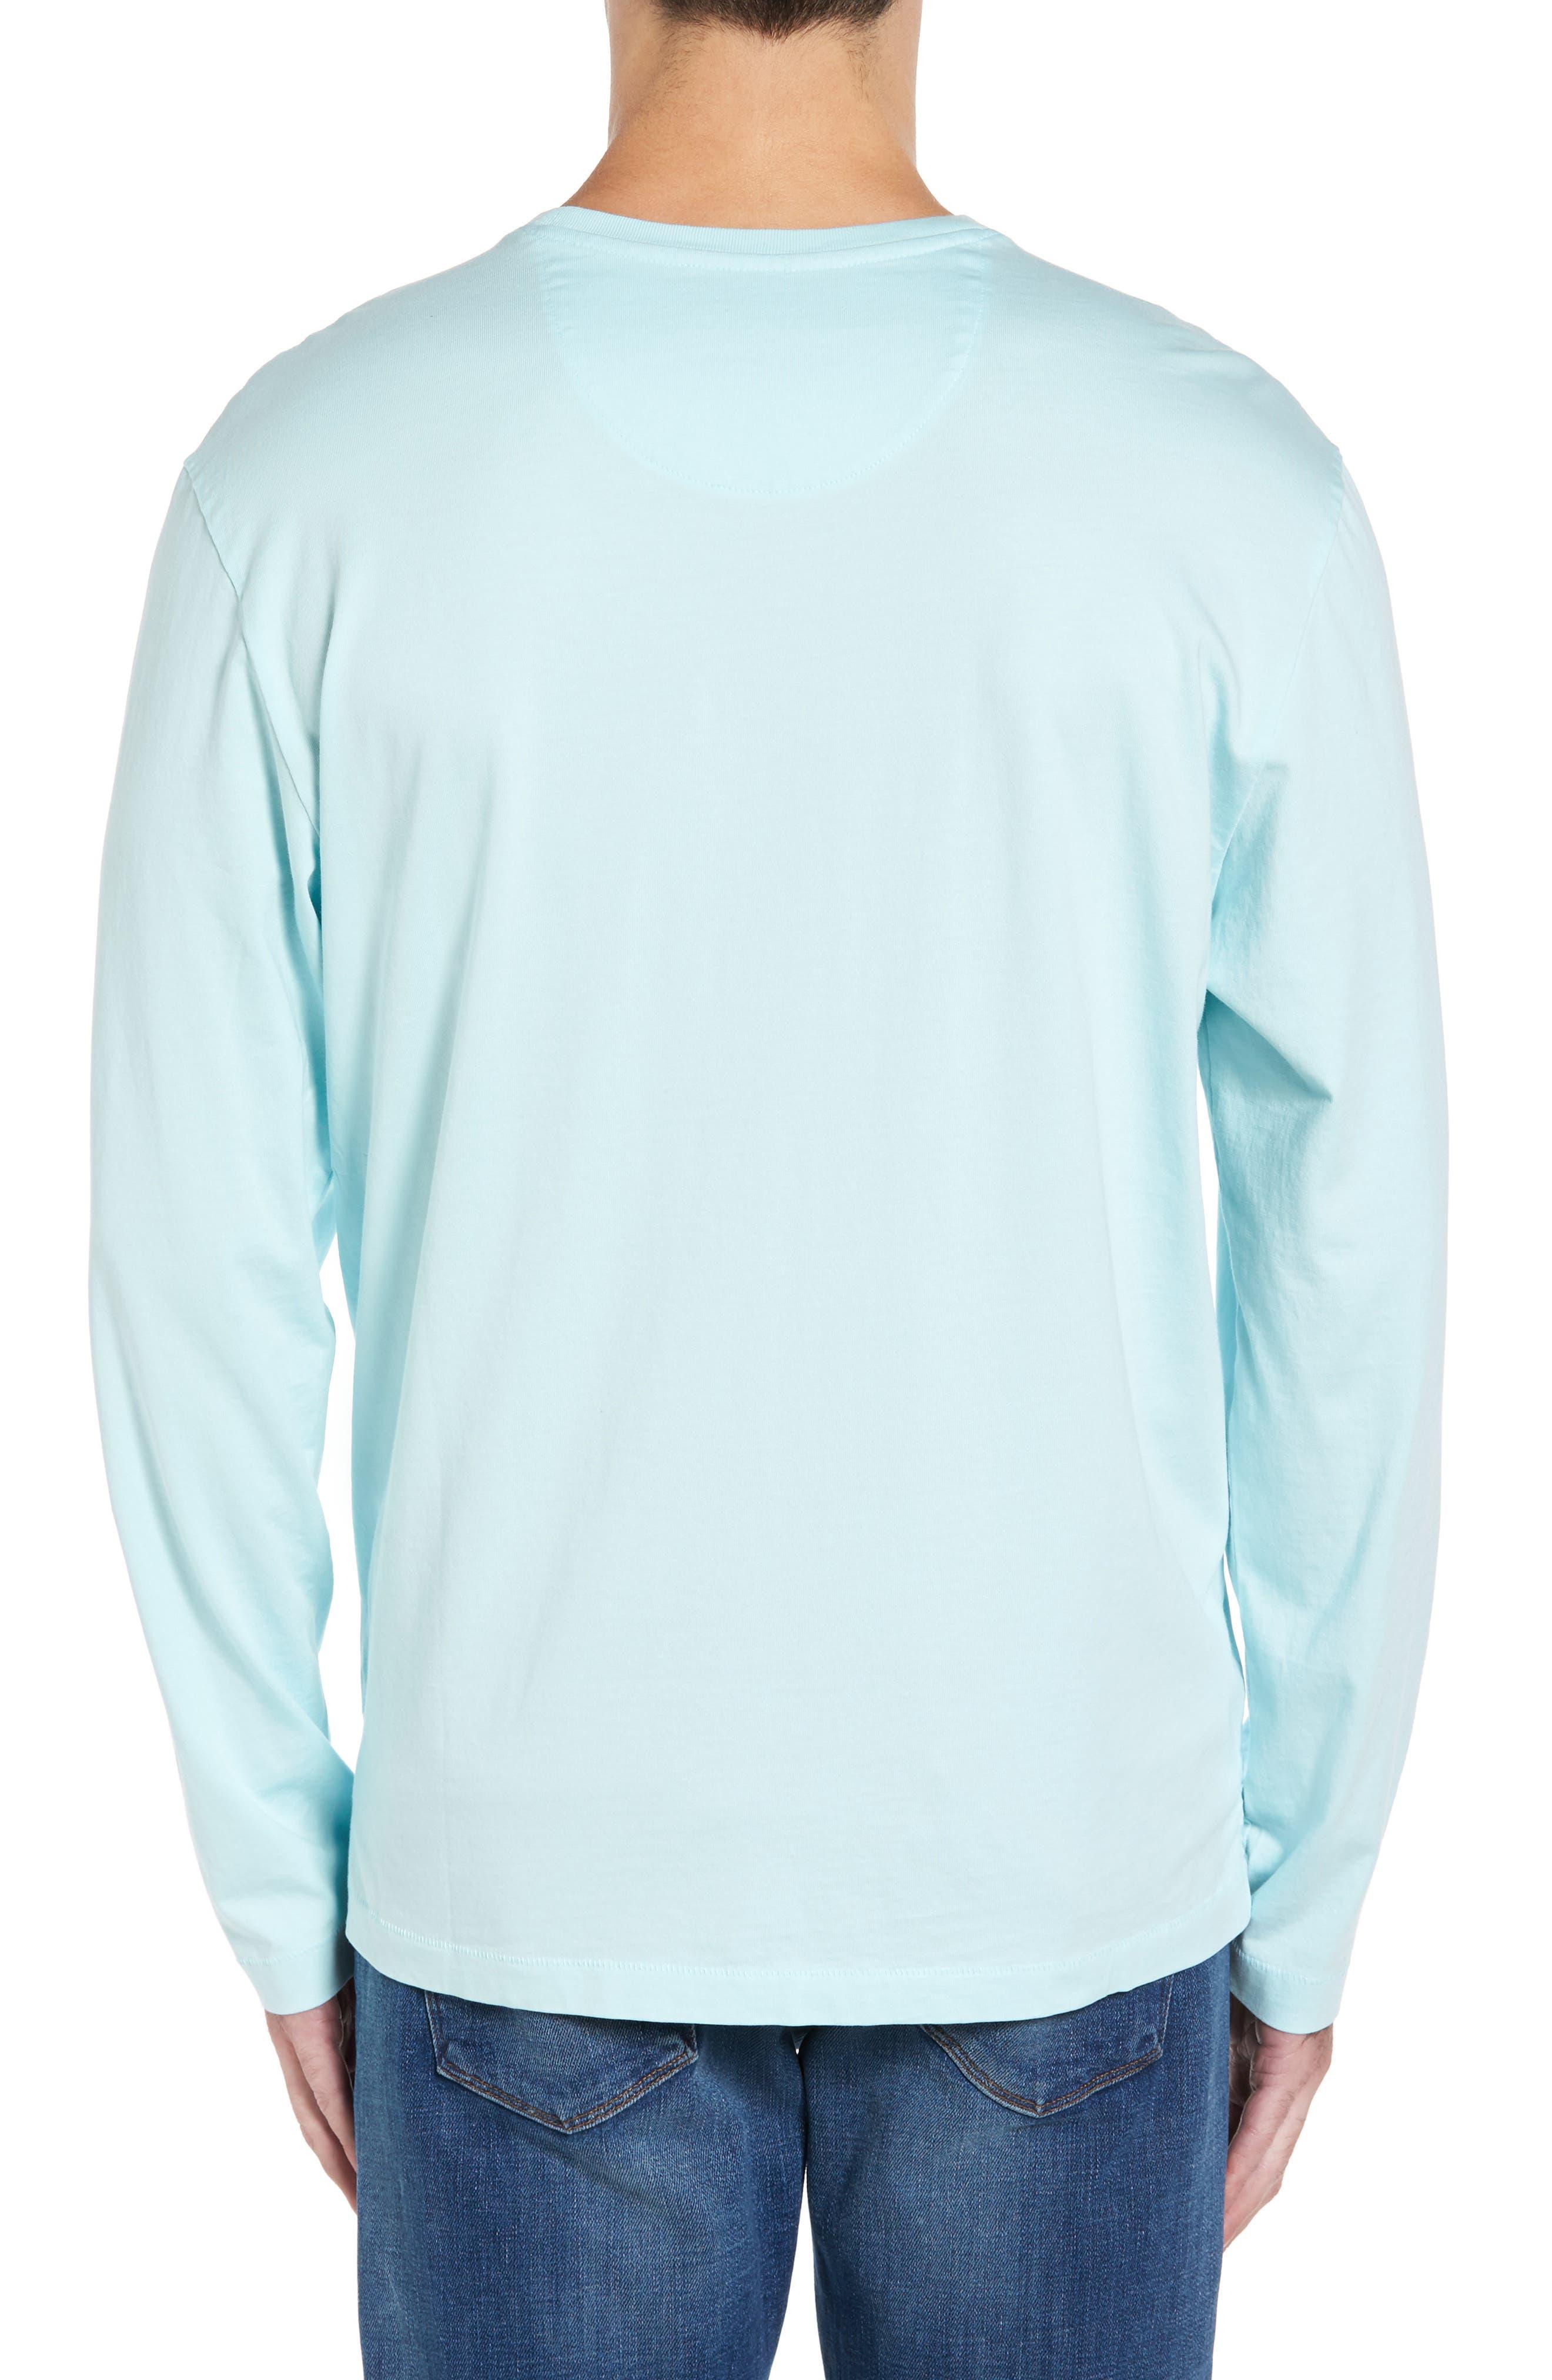 Alternate Image 2  - Tommy Bahama 'Bali Skyline' Long Sleeve Pima Cotton T-Shirt (Big & Tall)